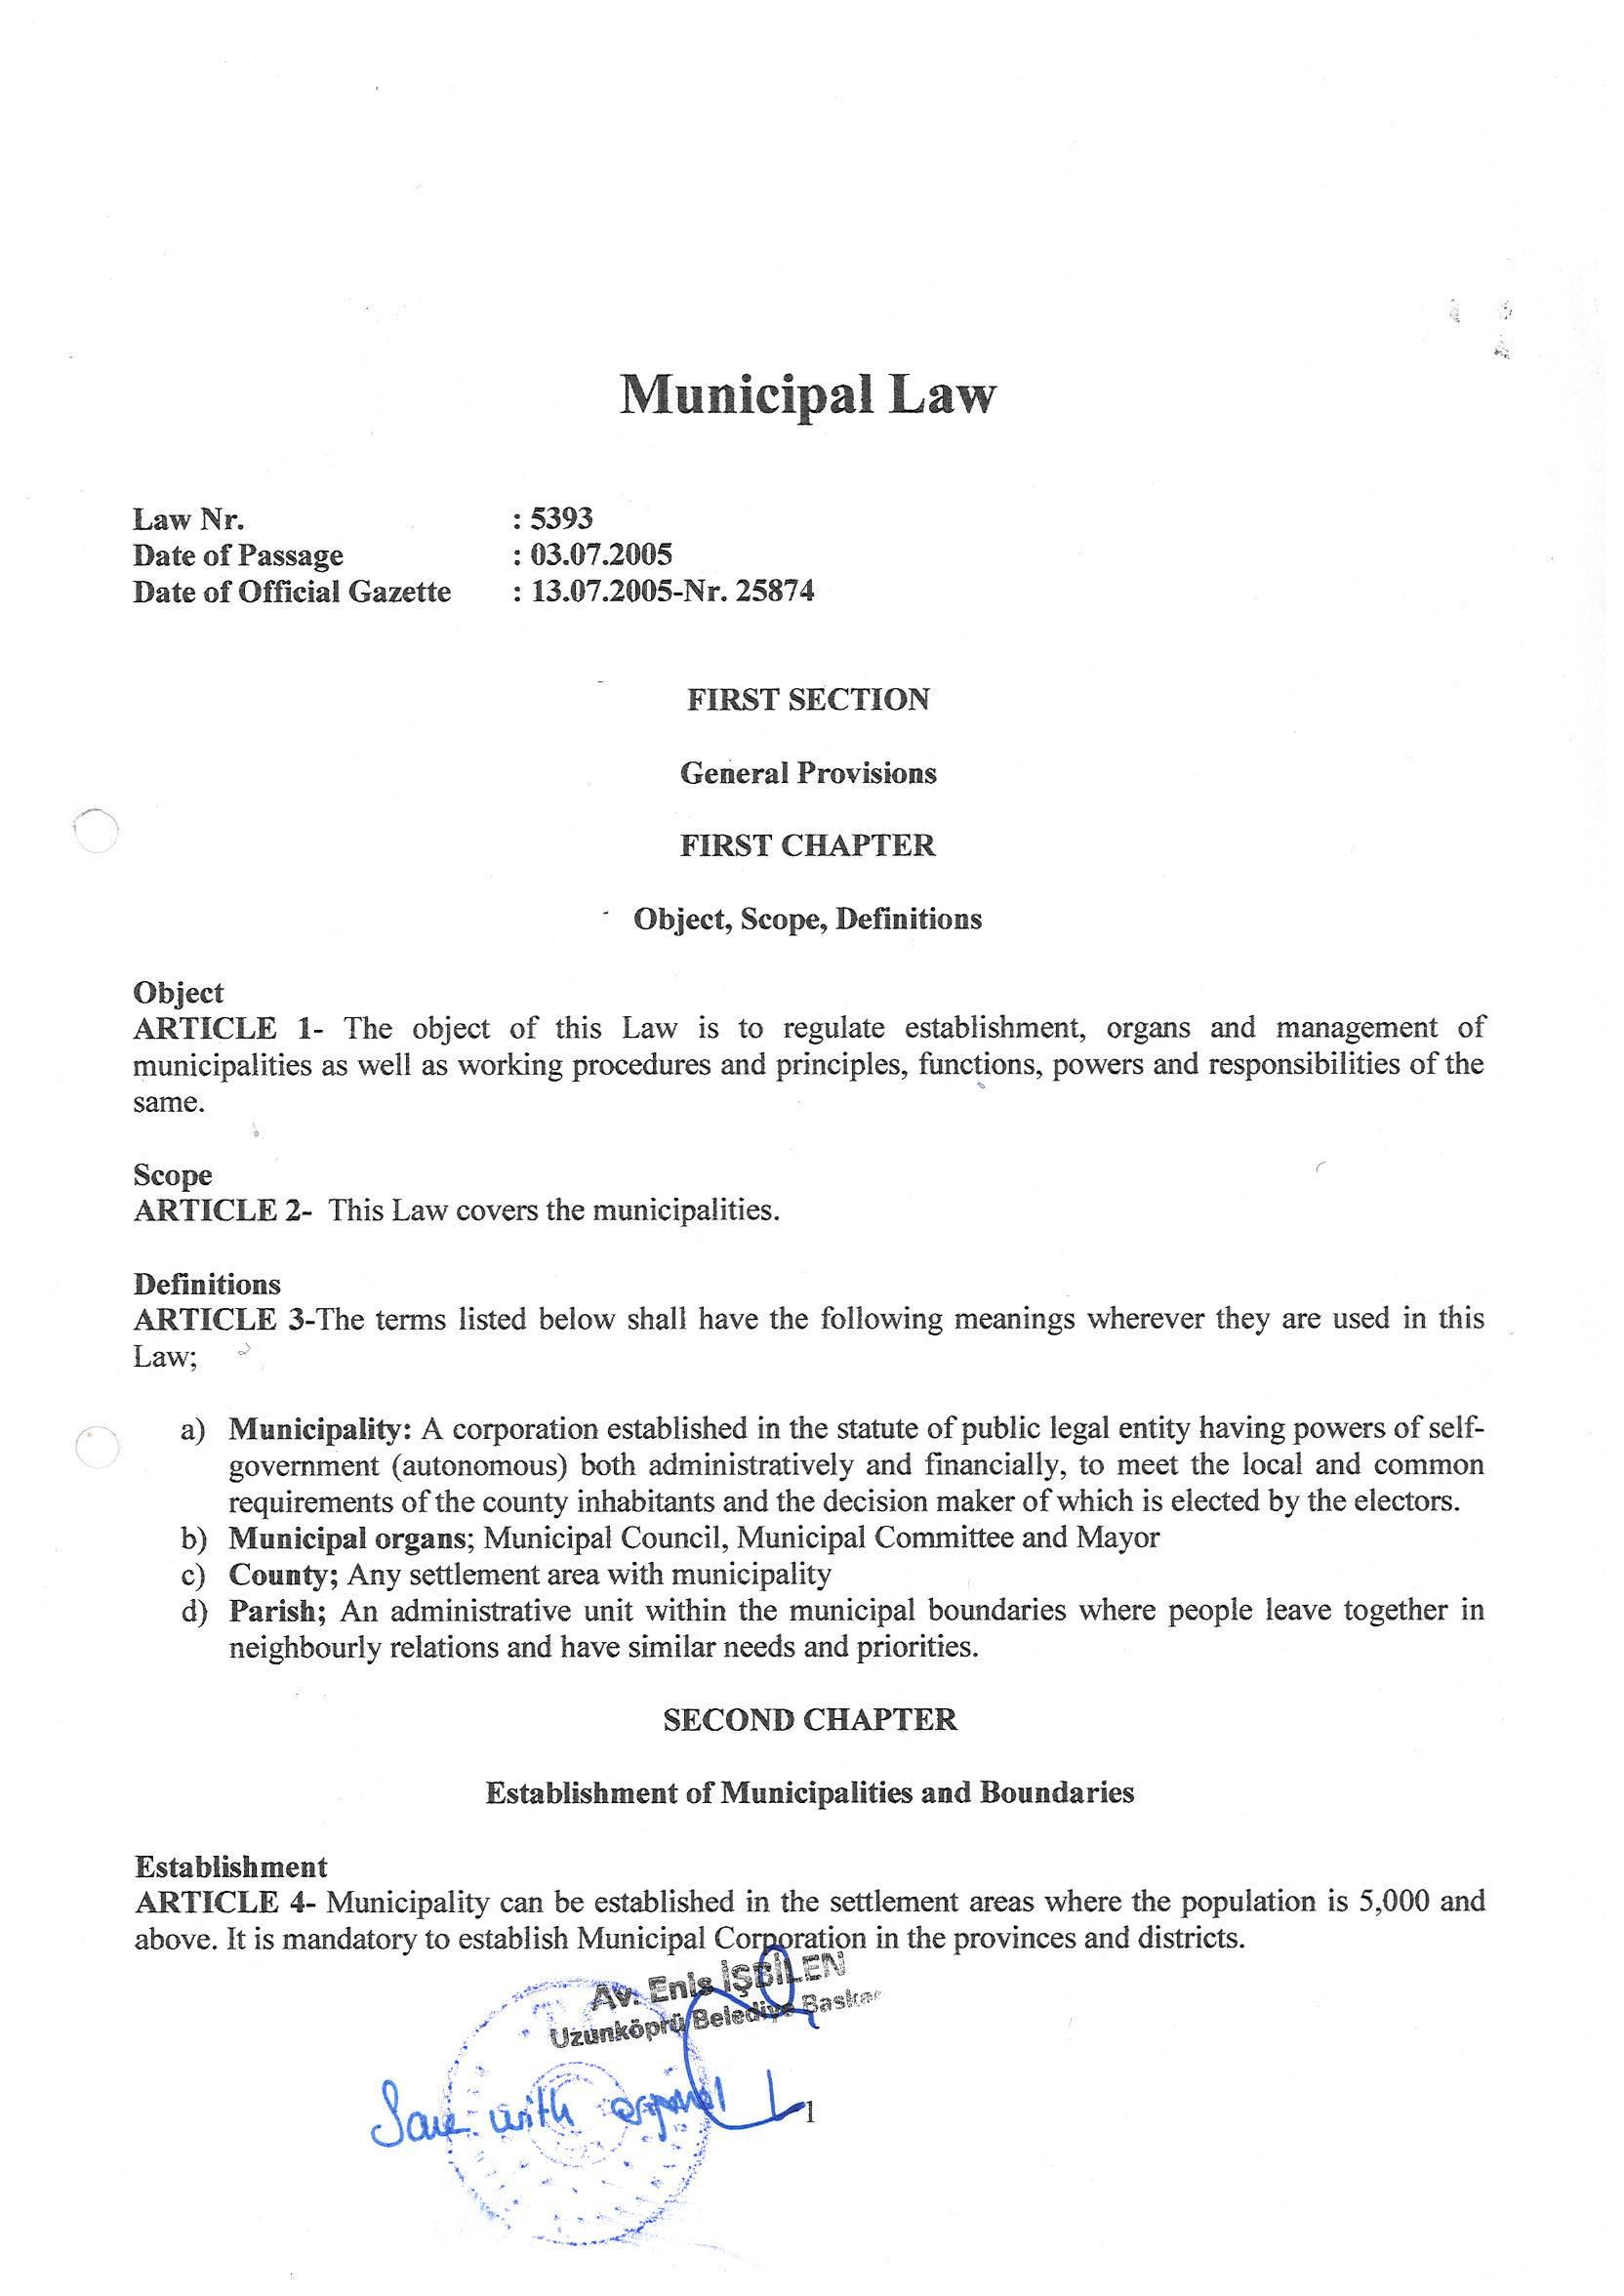 Registration Act - I part